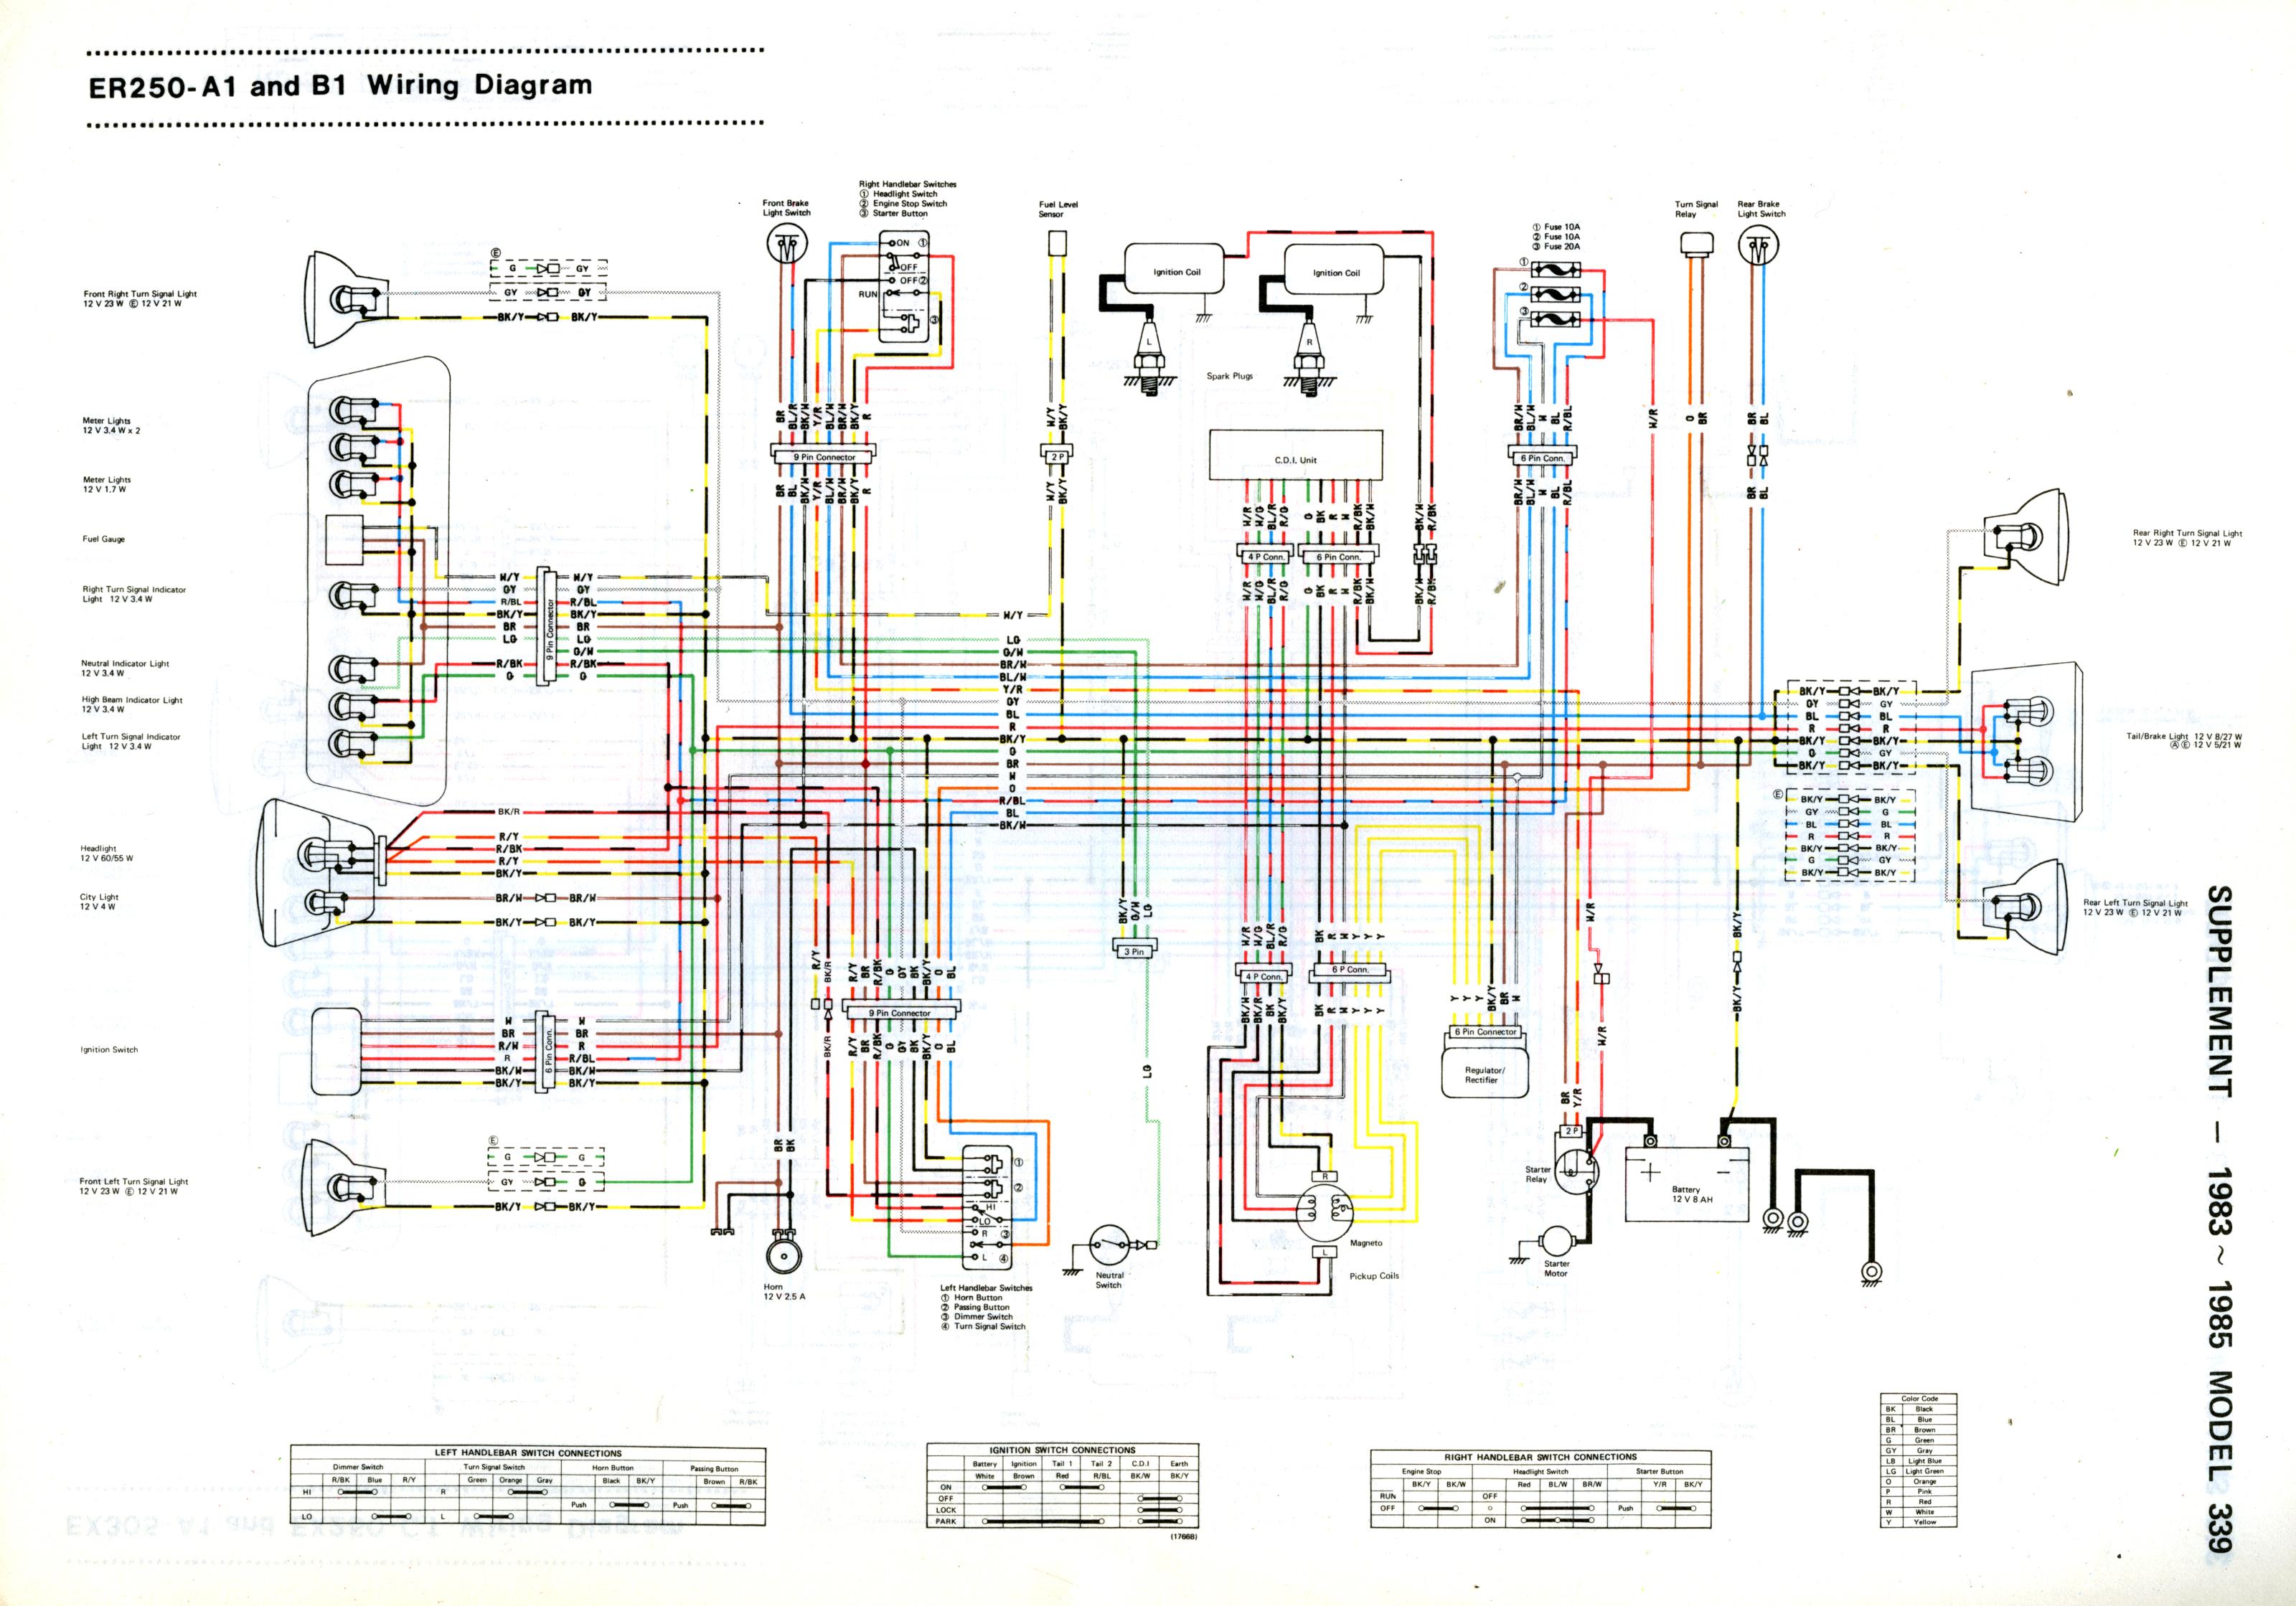 GV_1684] Kawasaki 250 Ltd Wiring Diagram Download DiagramArnes Omen Phae Mohammedshrine Librar Wiring 101